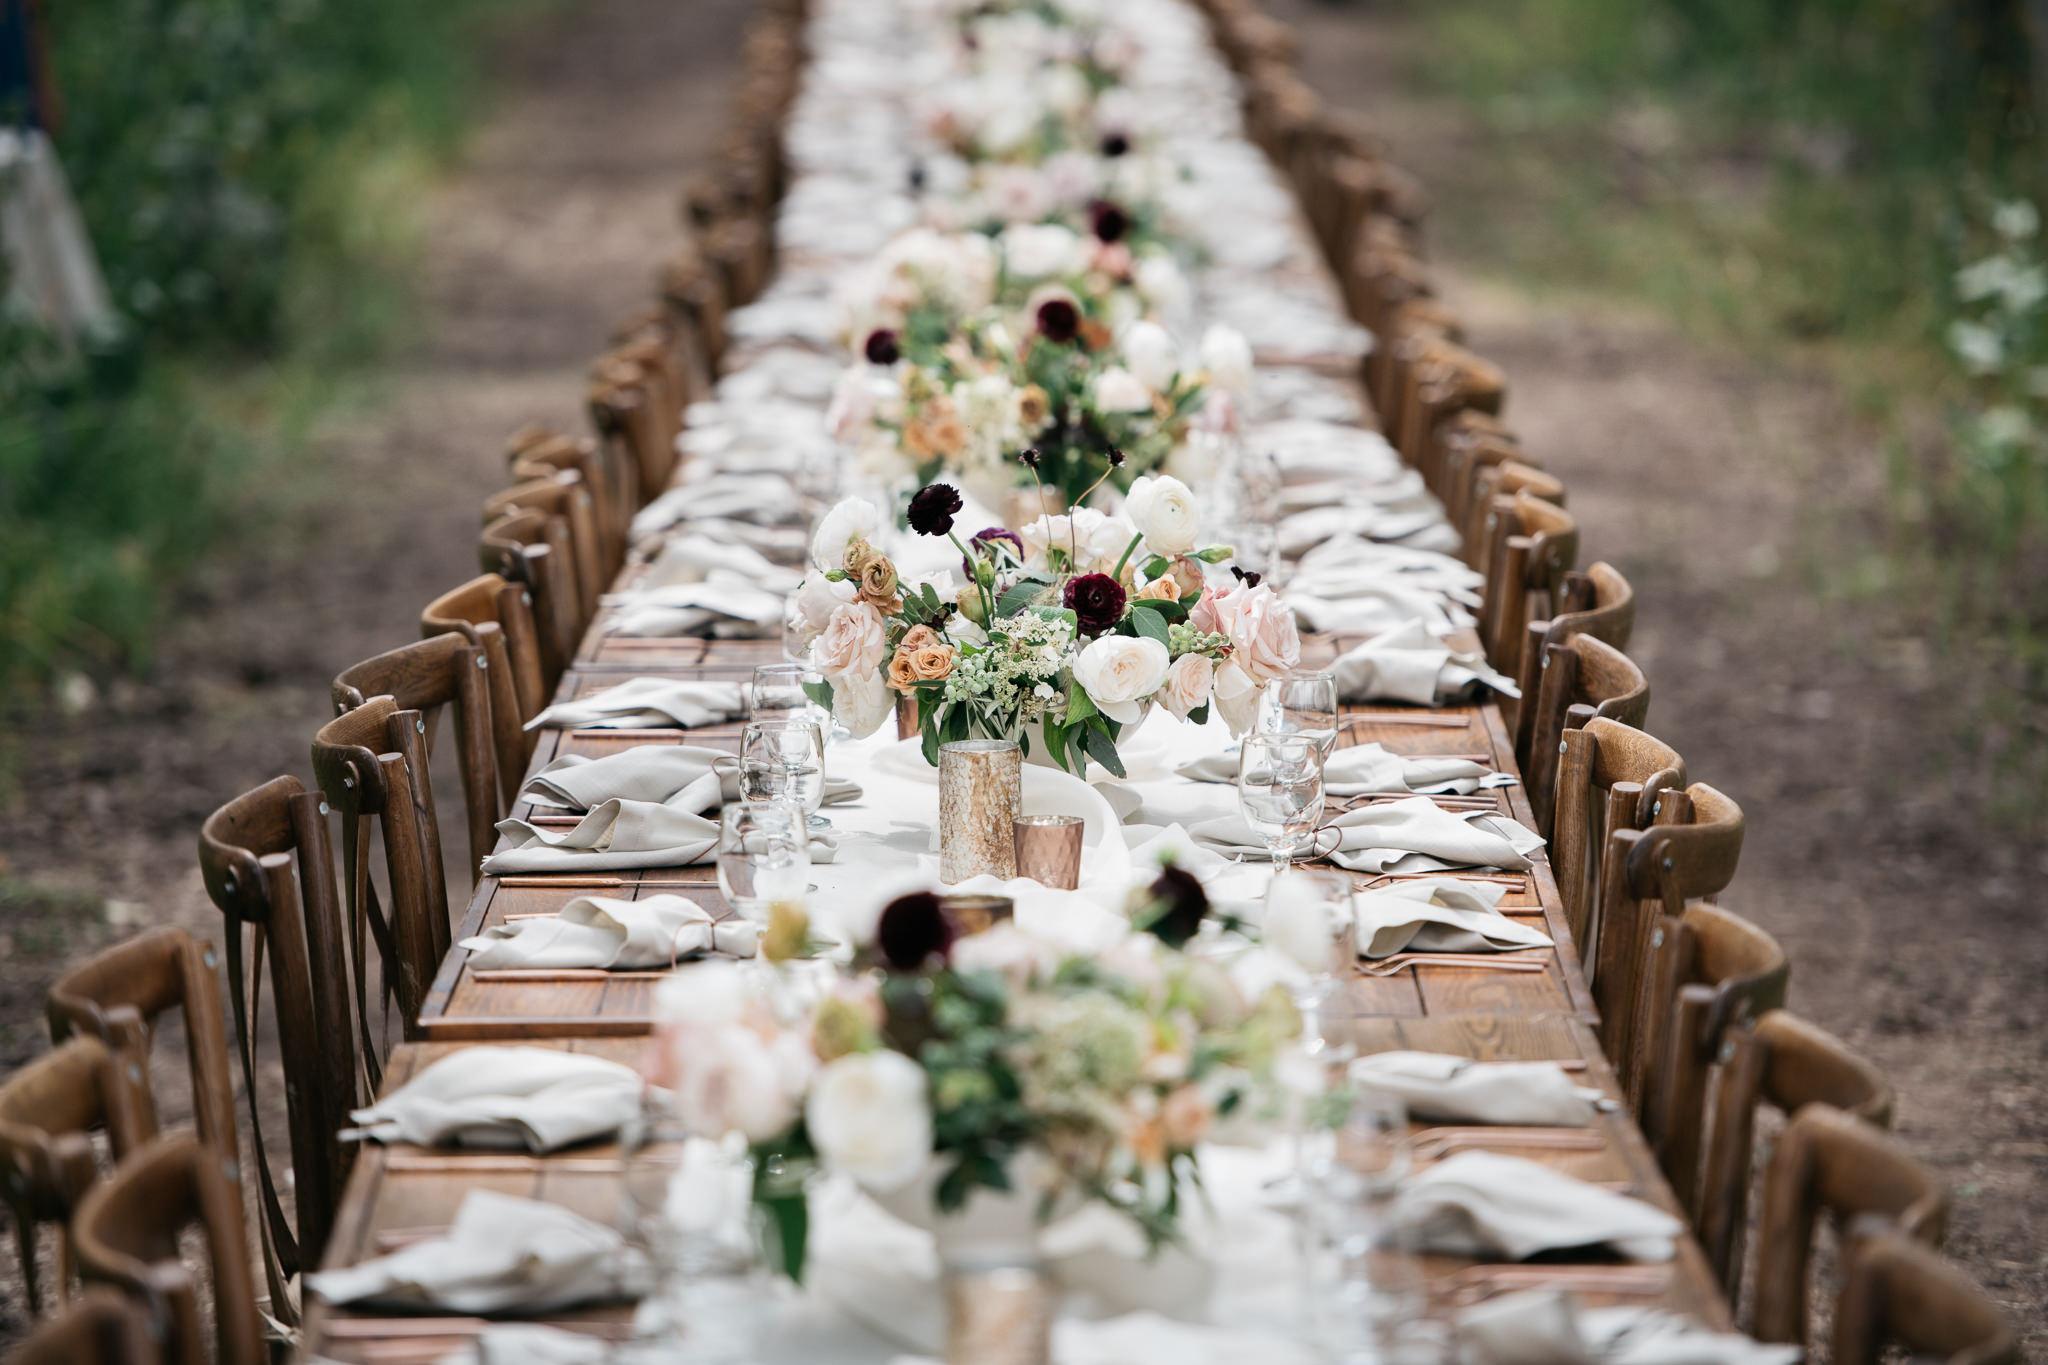 427_ONL_Kat_Nick_Wedding_Trevor_Hooper_Photo.jpg